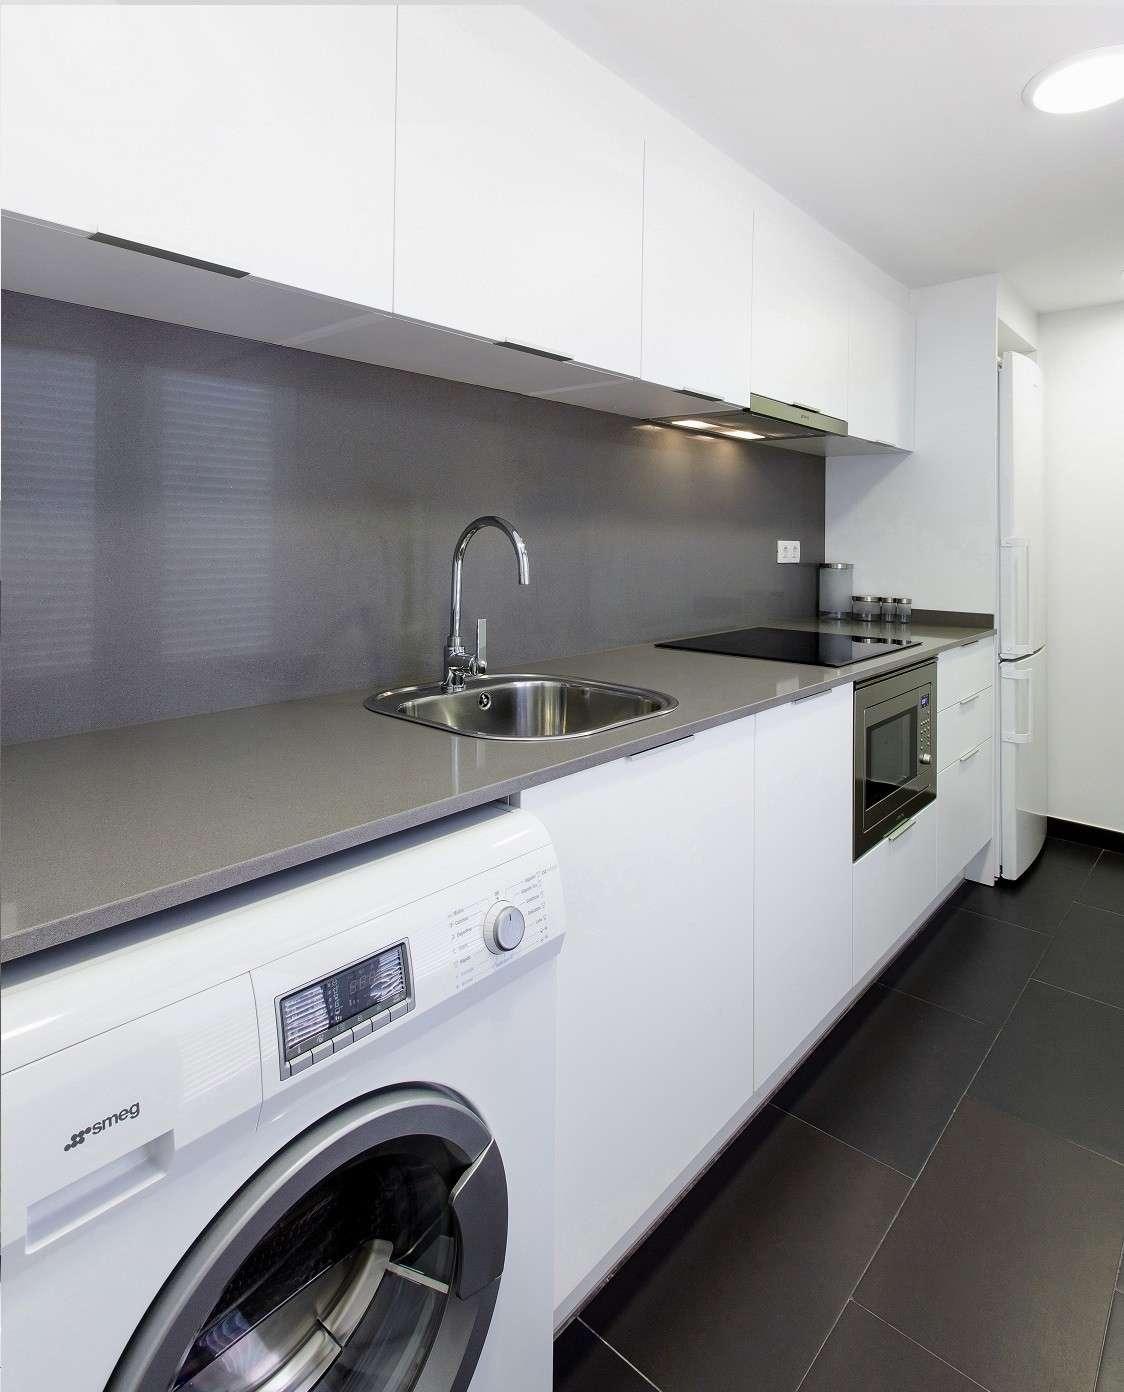 Dailyflats Sagrada Familia 1-bedroom (1-4 adults) Attic apartment in Barcelona 12